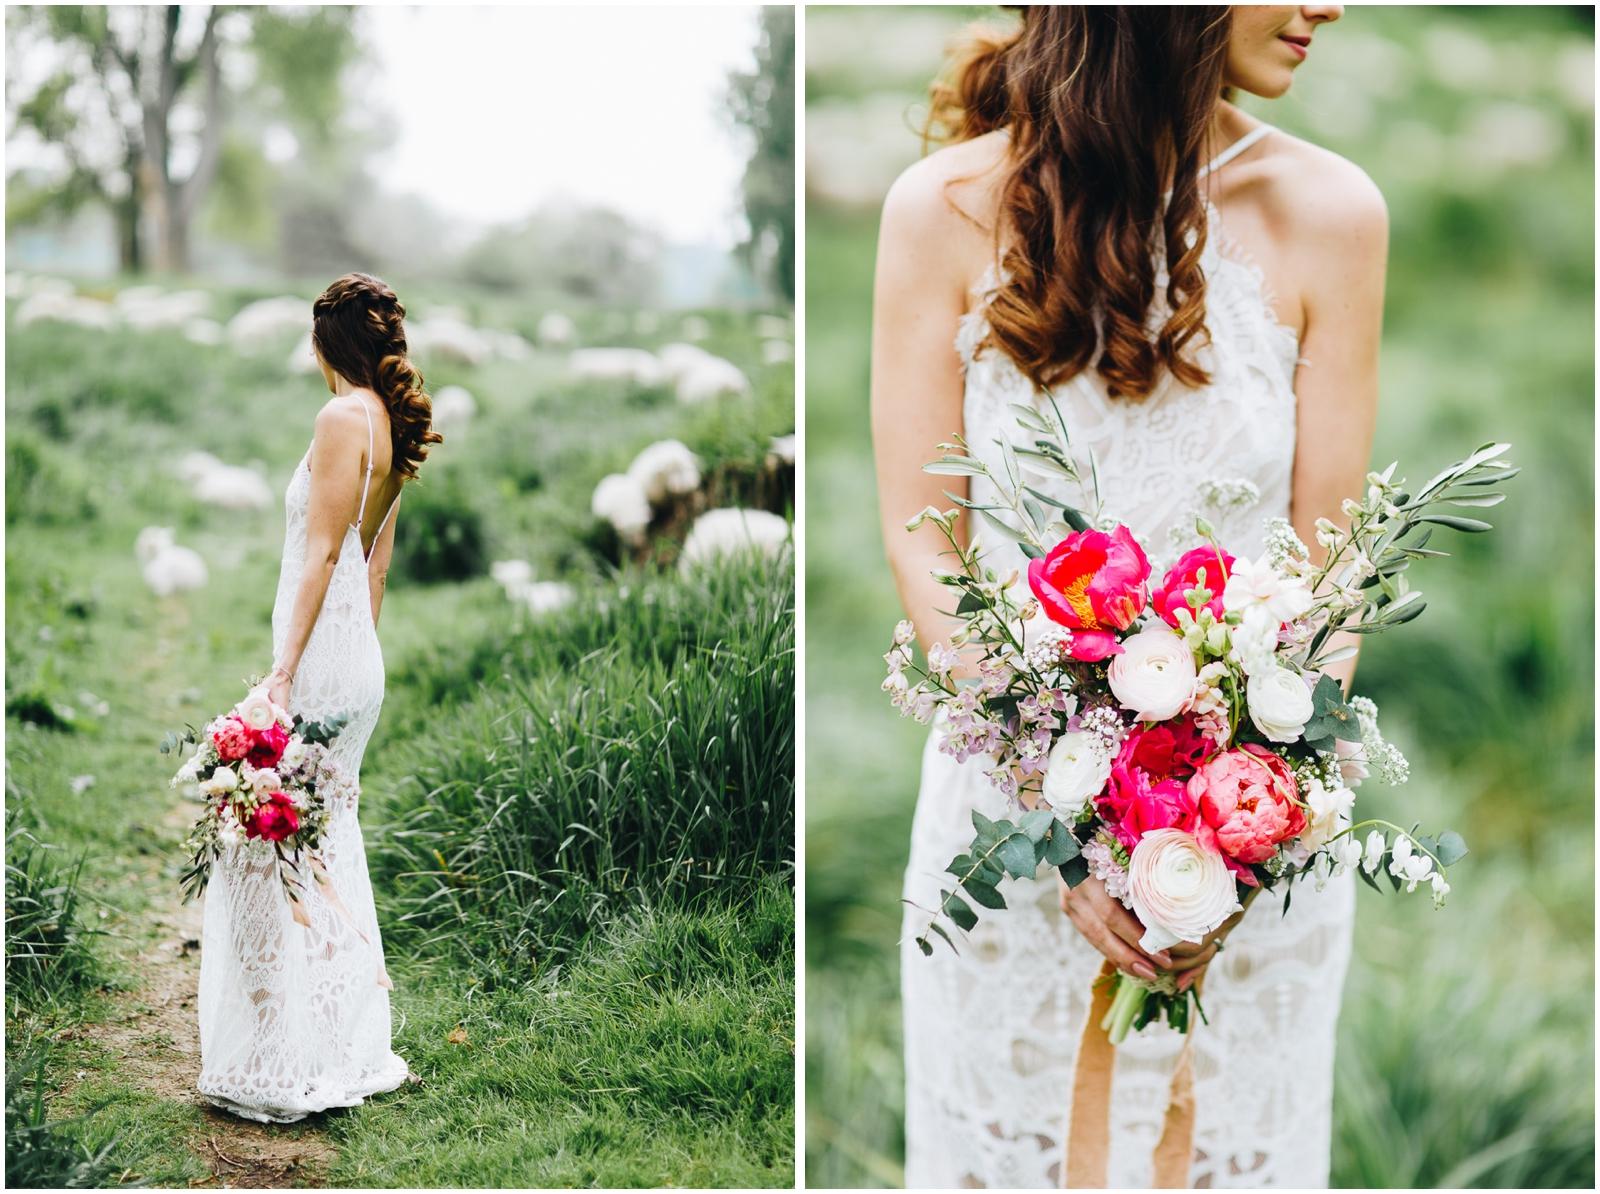 LE HAI LINH Photography-Hochzeitsfotograf-Bohohochzeit-_0036.jpg